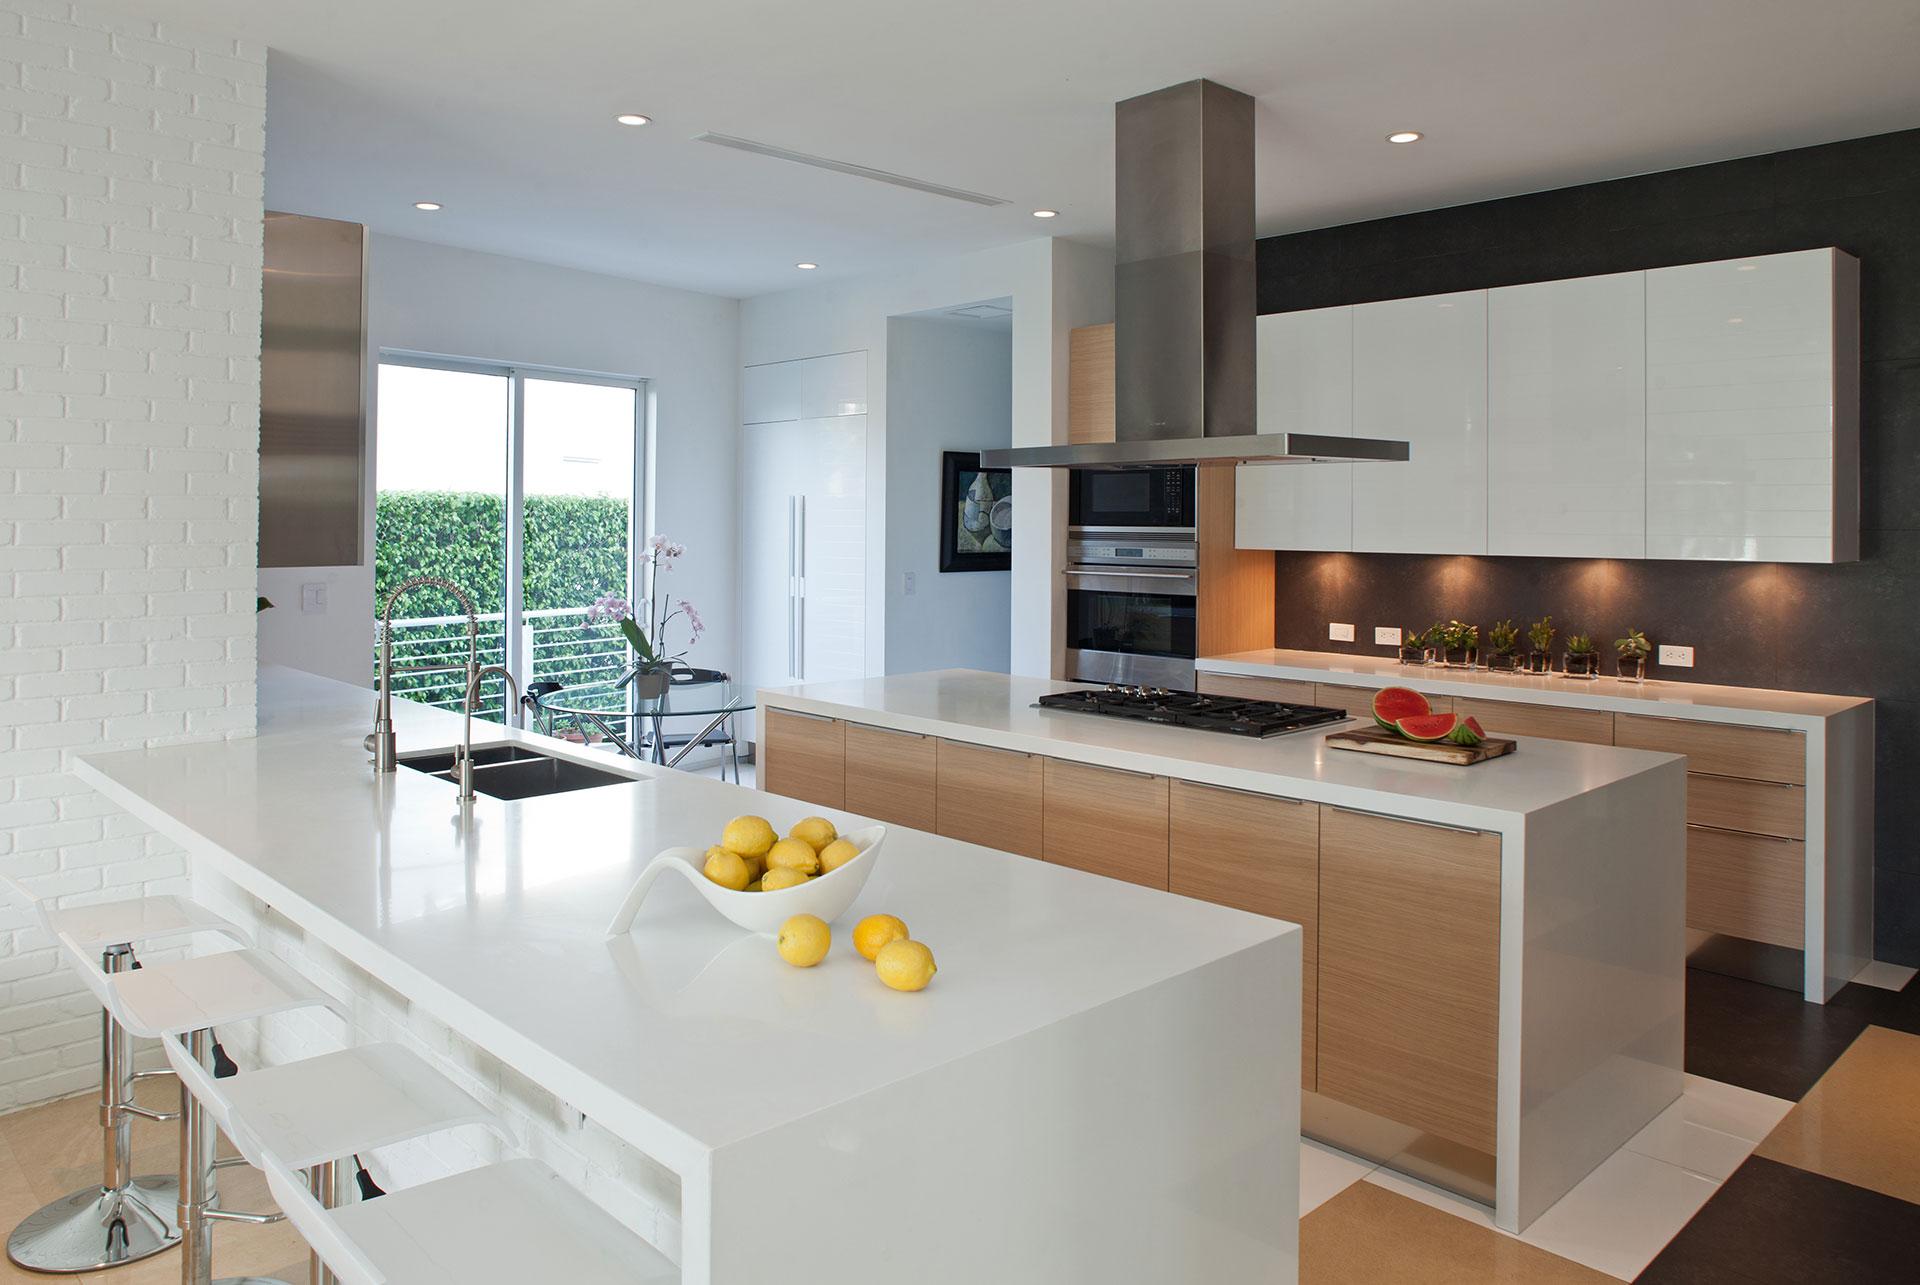 Interior Design kitchen view project in 96 Golden Beach Drive, Florida